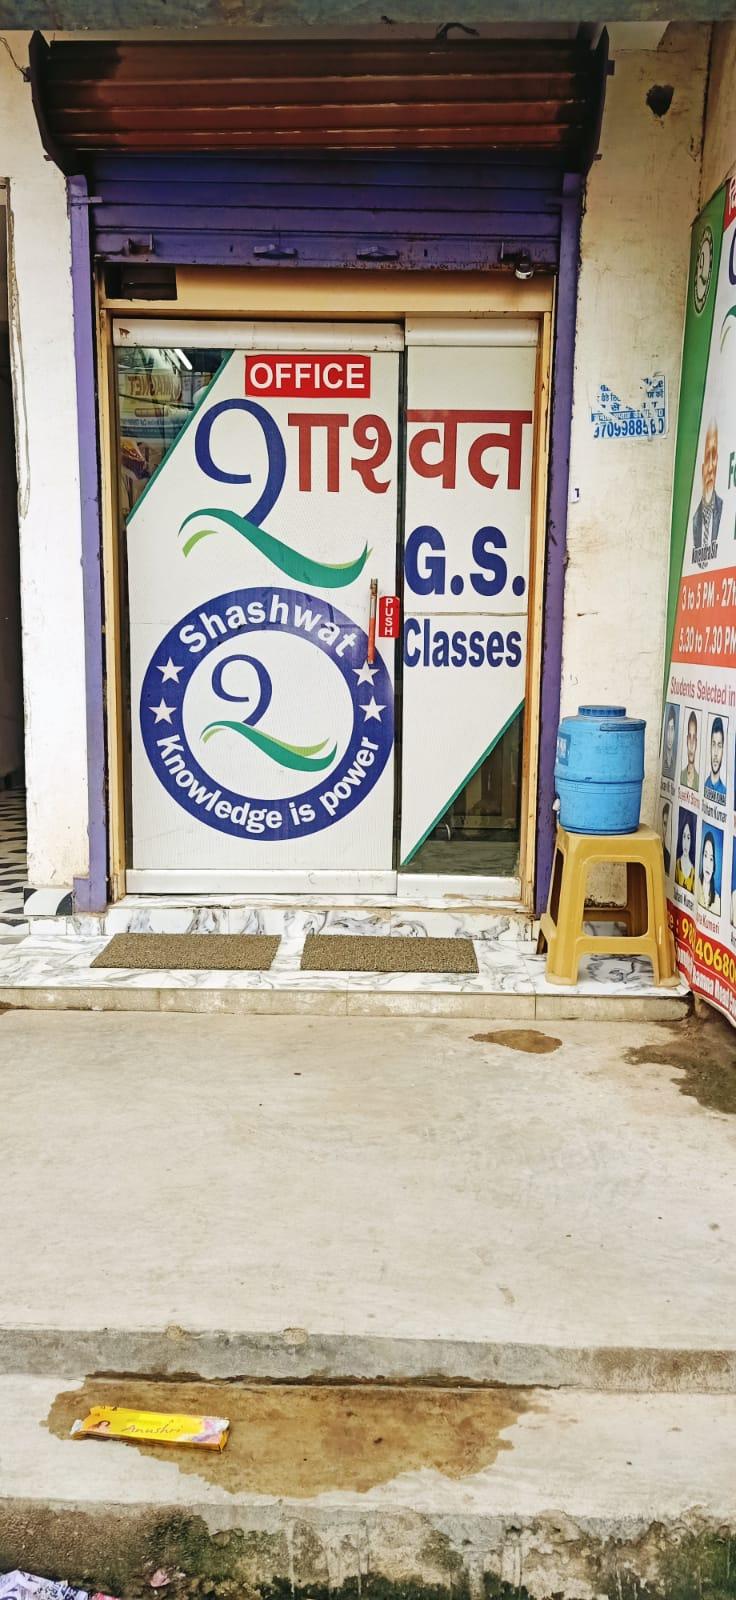 Shashwat GS Classes Gallery